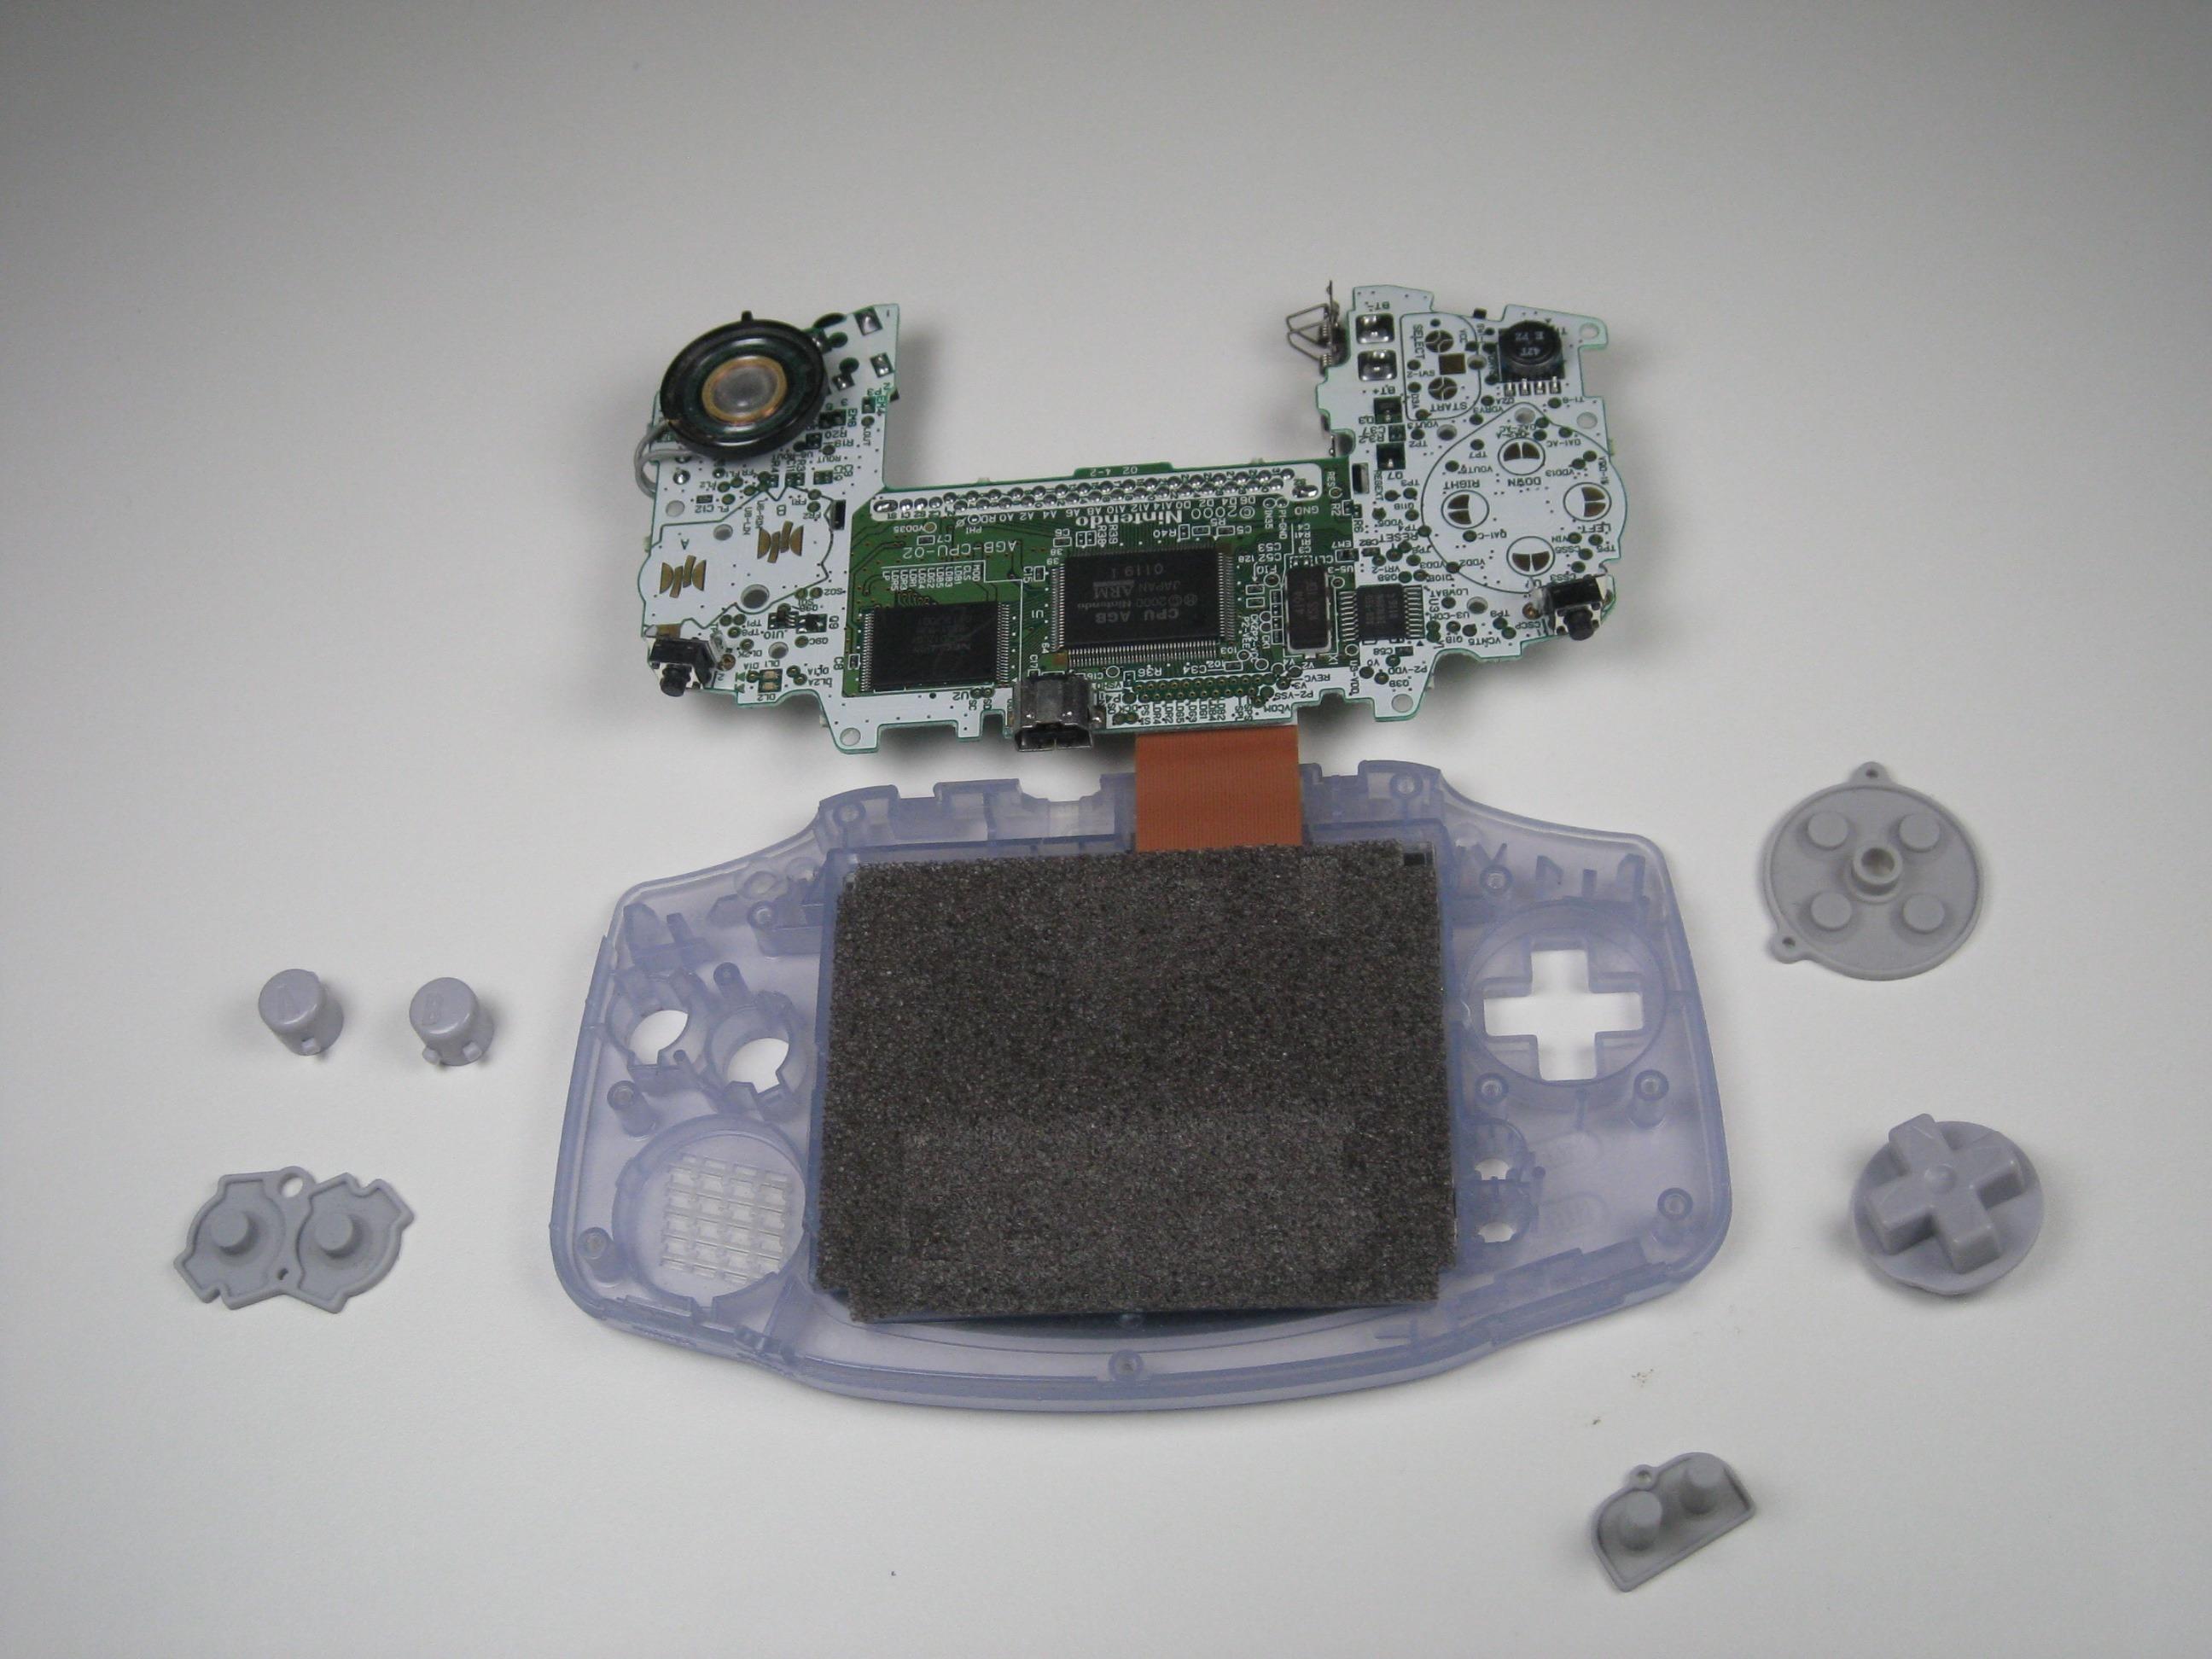 Game Boy Advance Teardown Ifixit Making Gameboy Systems Circuit